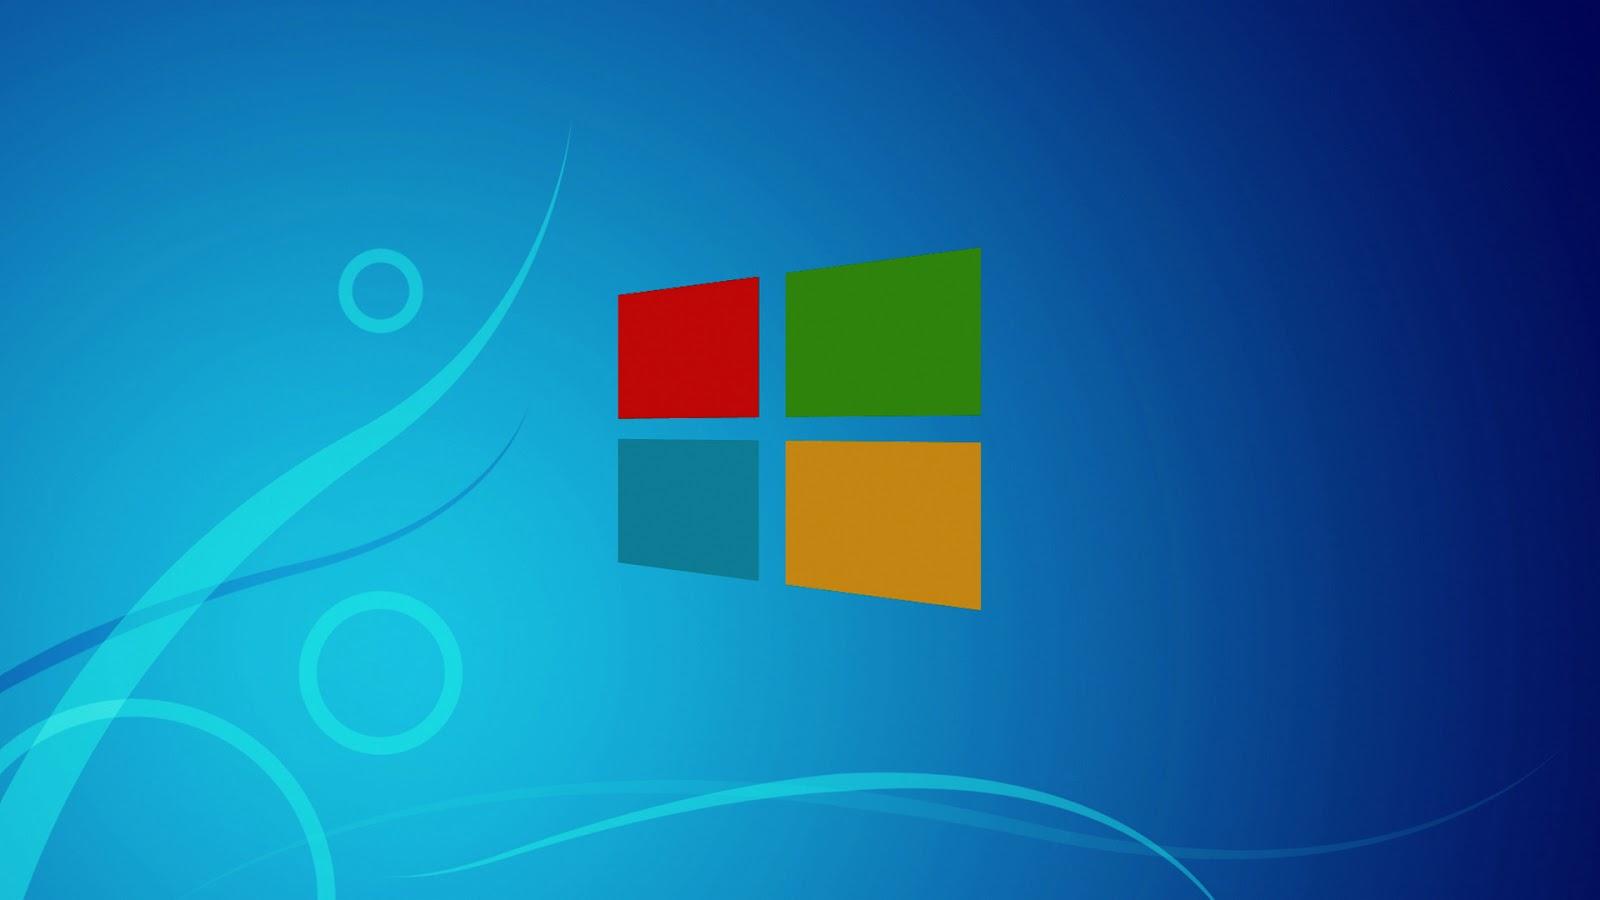 windows 8 hd wallpaper 1080p windows 8 hd wallpaper 1080p 1600x900